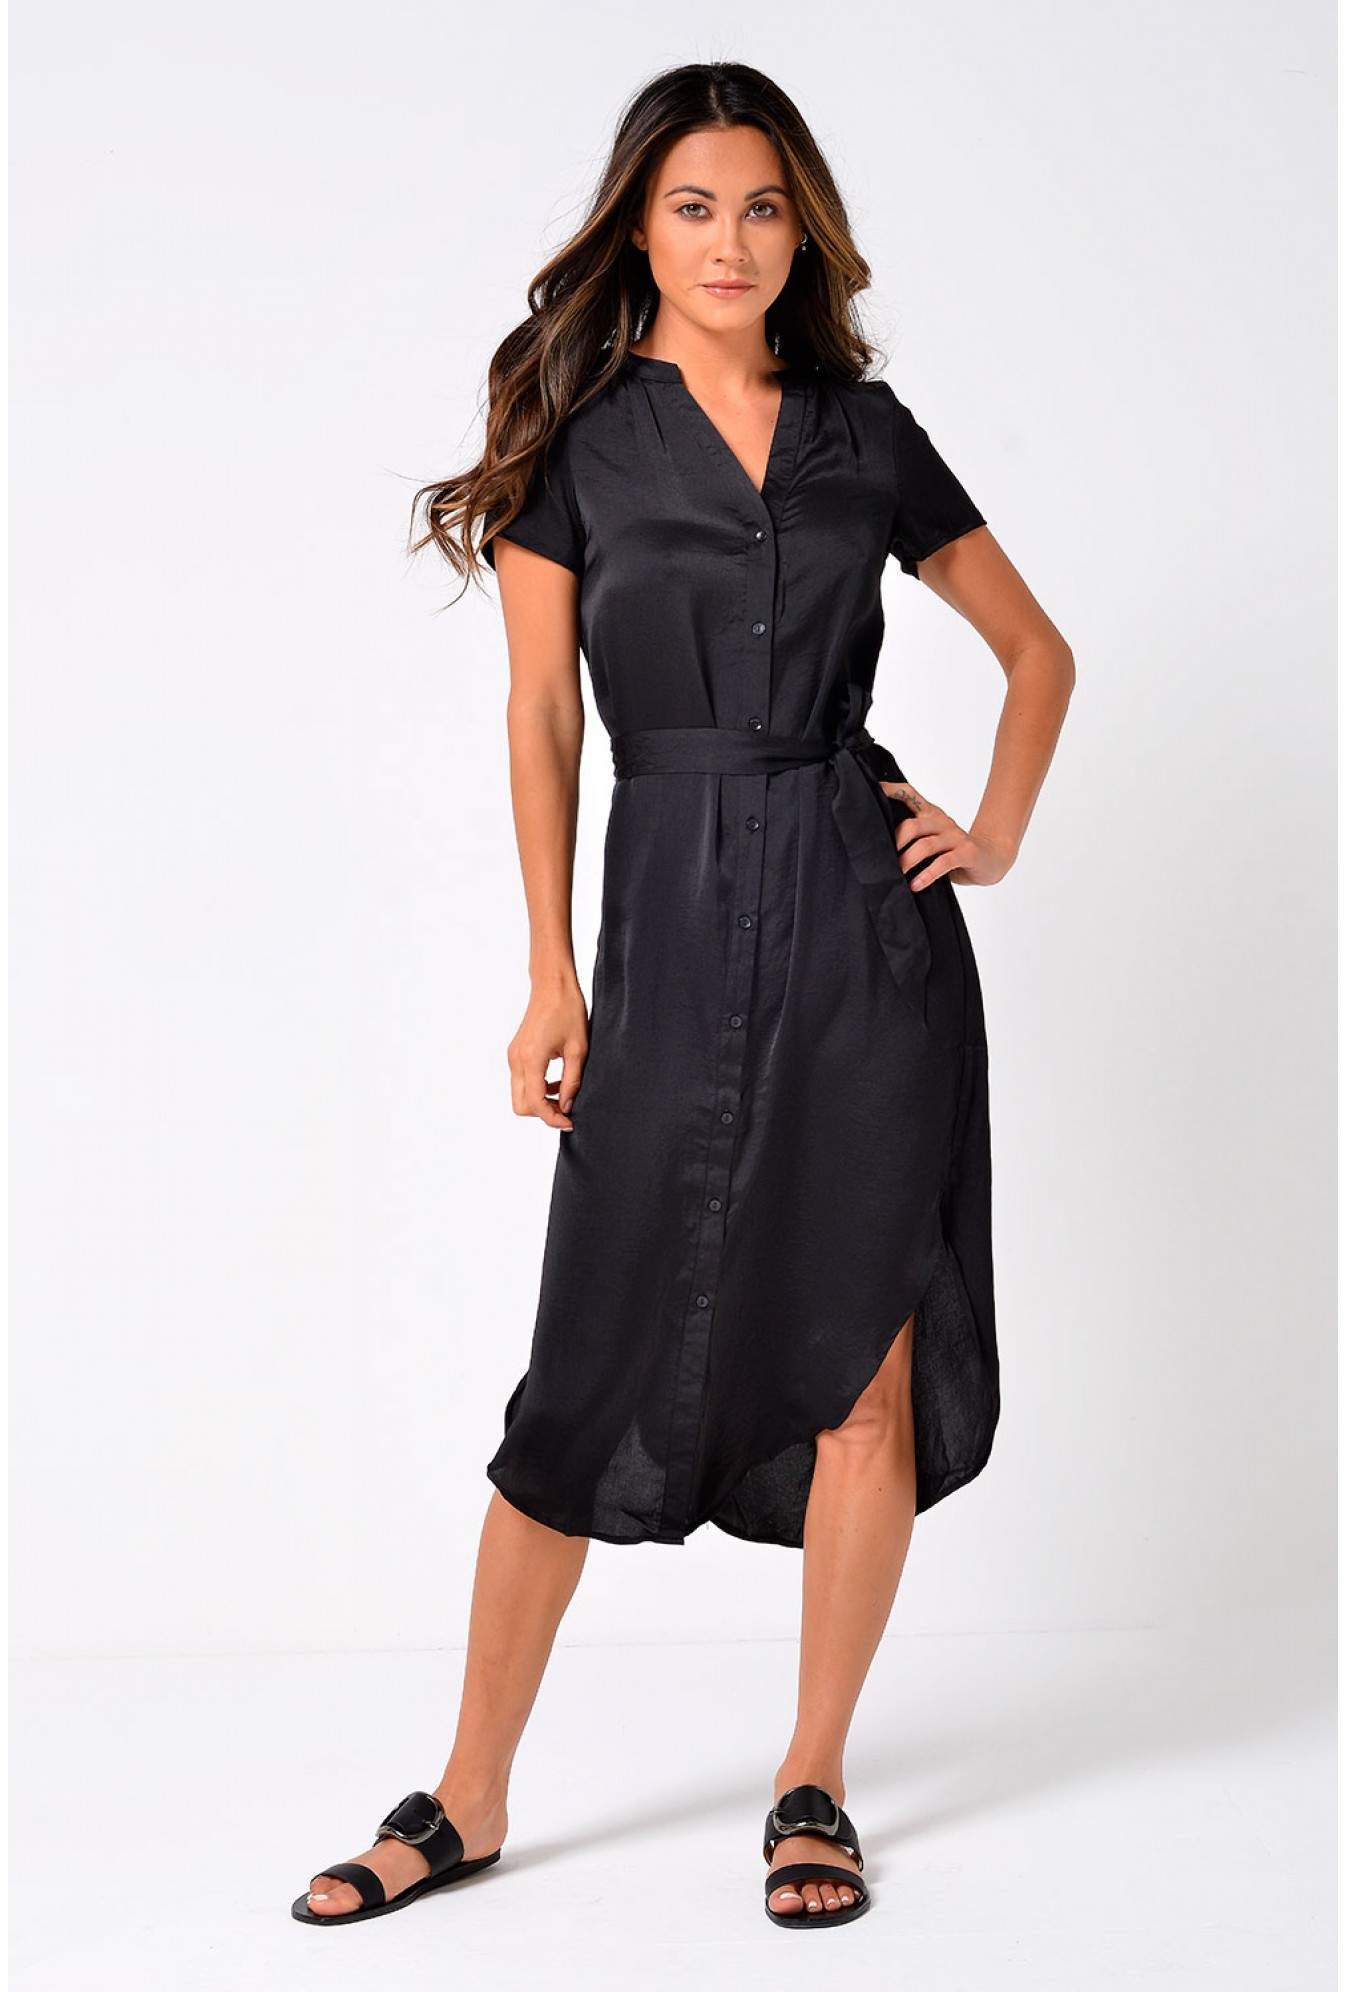 79320cdac14a7 Vero Moda Mala Belt Shirt Dress in Black | iCLOTHING